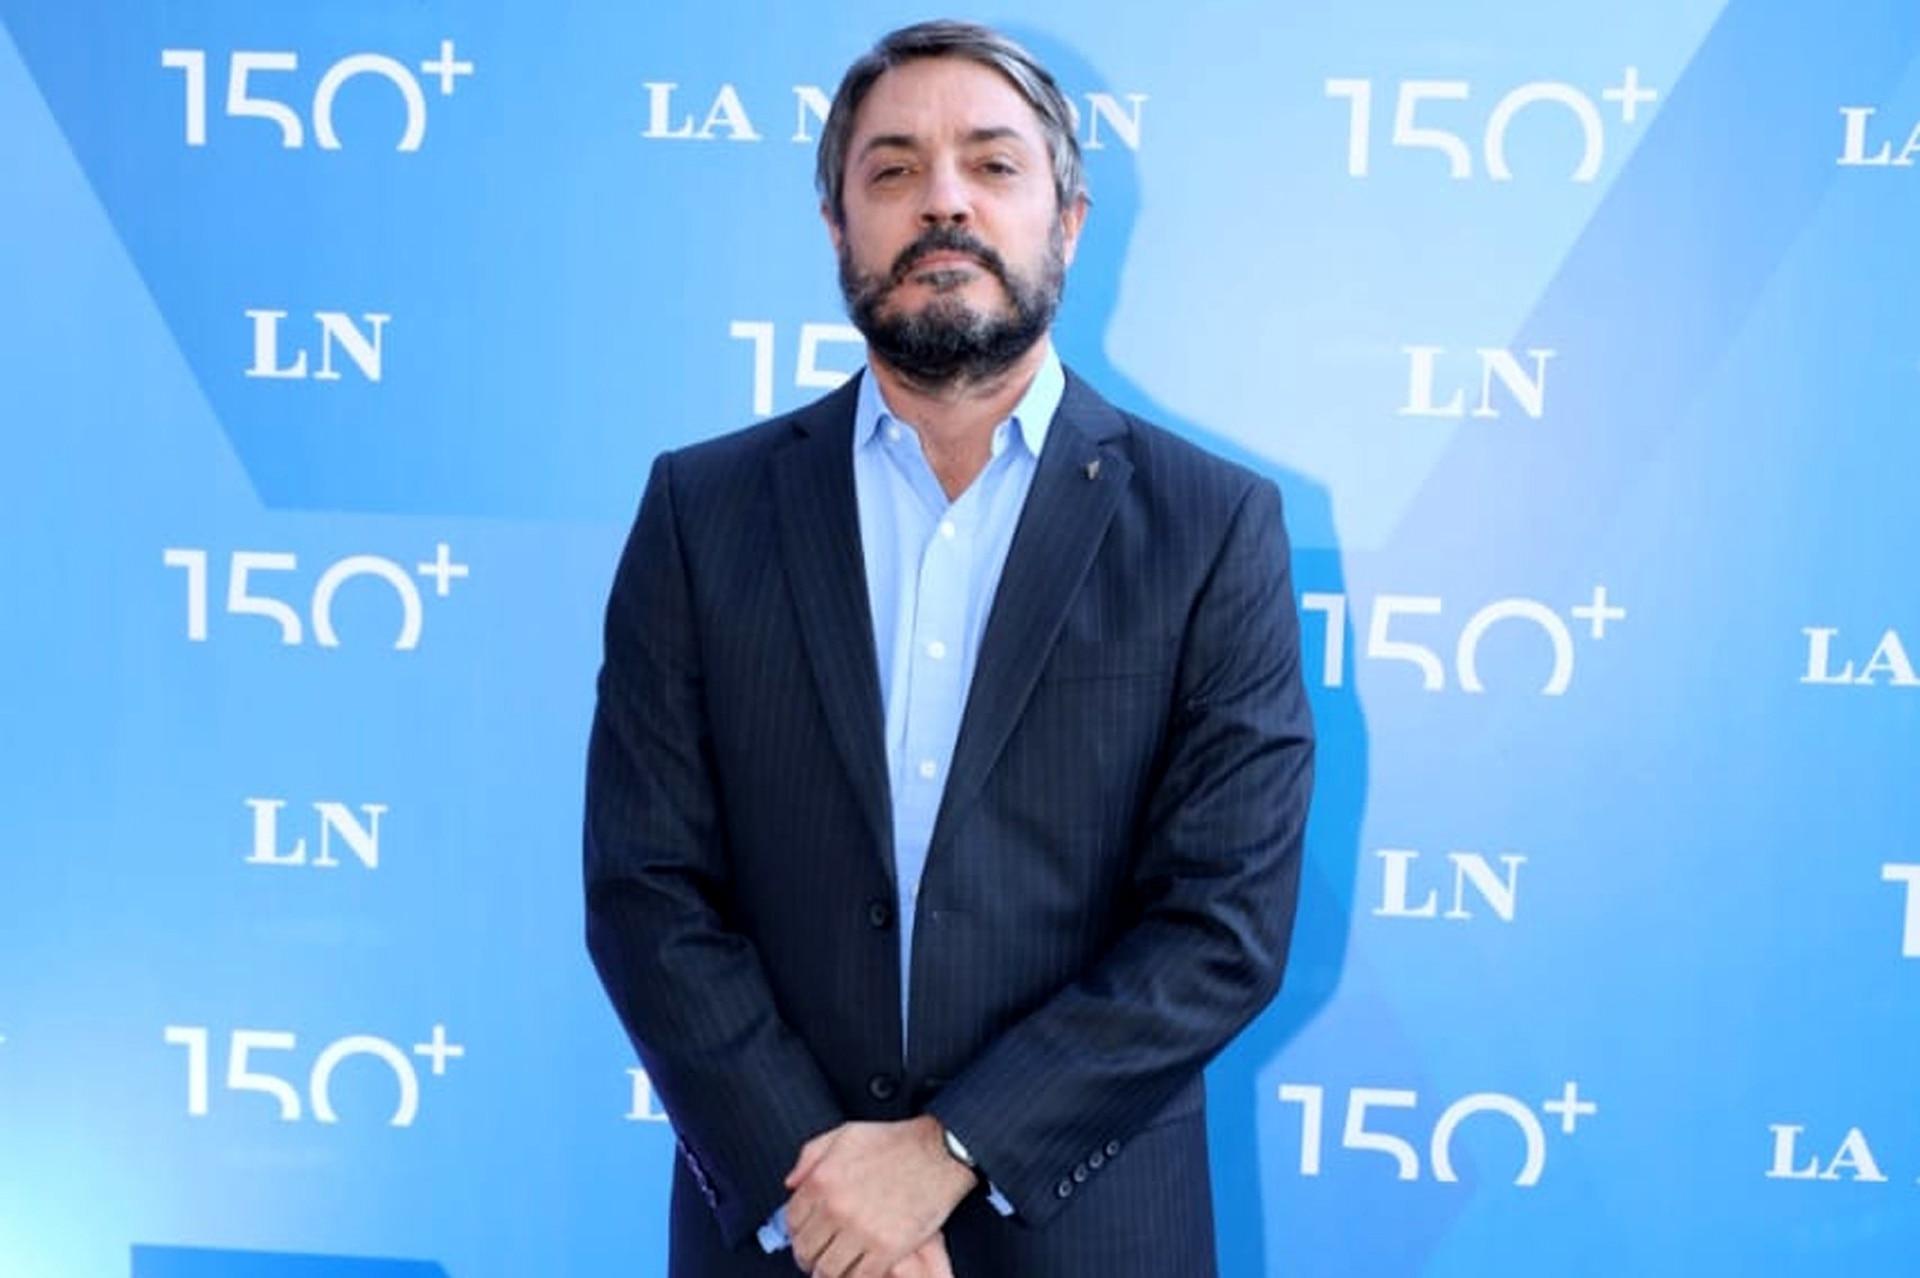 Gastón Perez Izquierdo, CEO de Catena Zapata